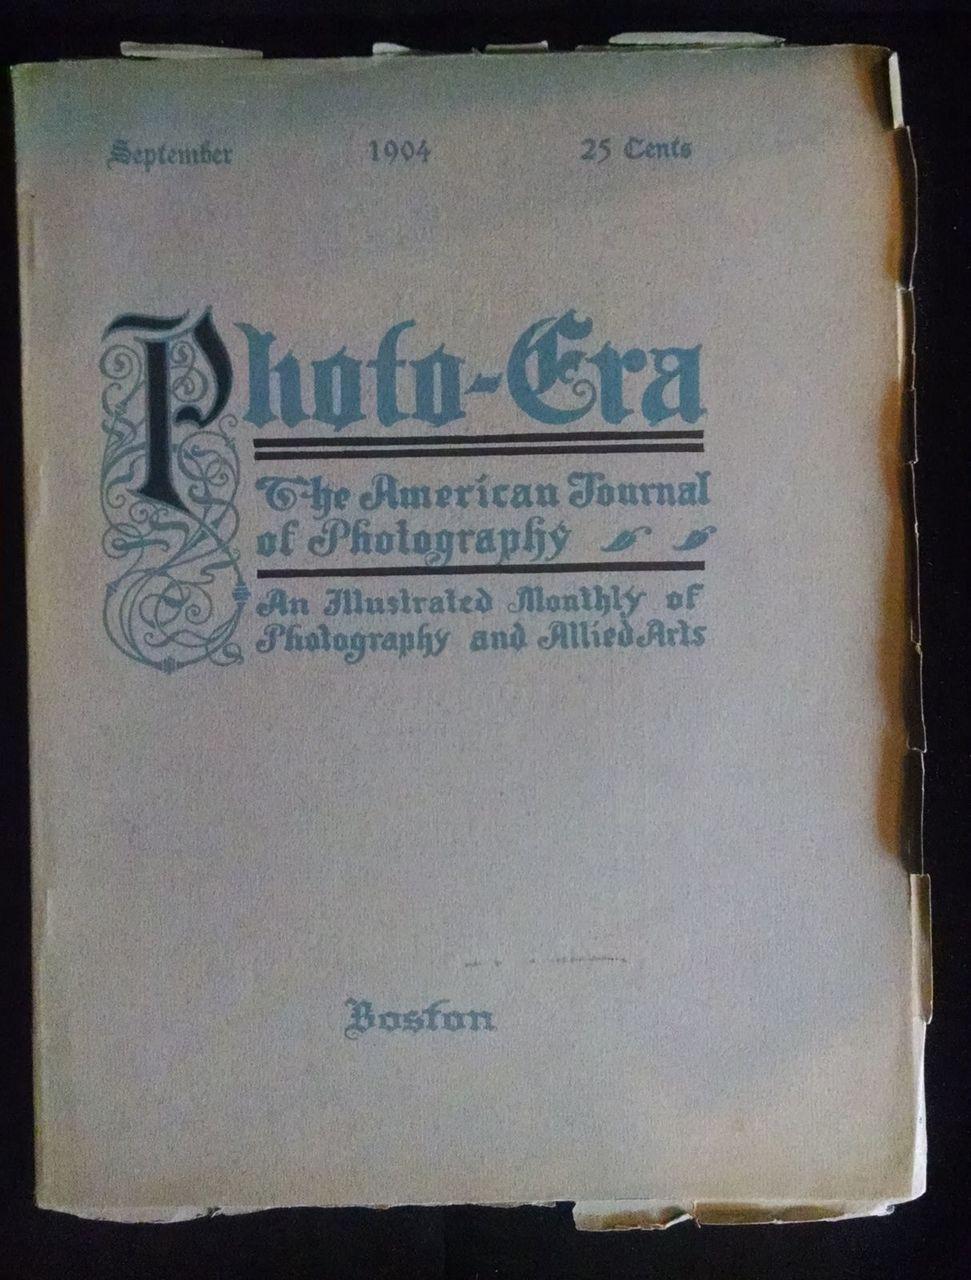 PHOTO-ERA September 1904 Photograph Illustrated Art Journal Photography